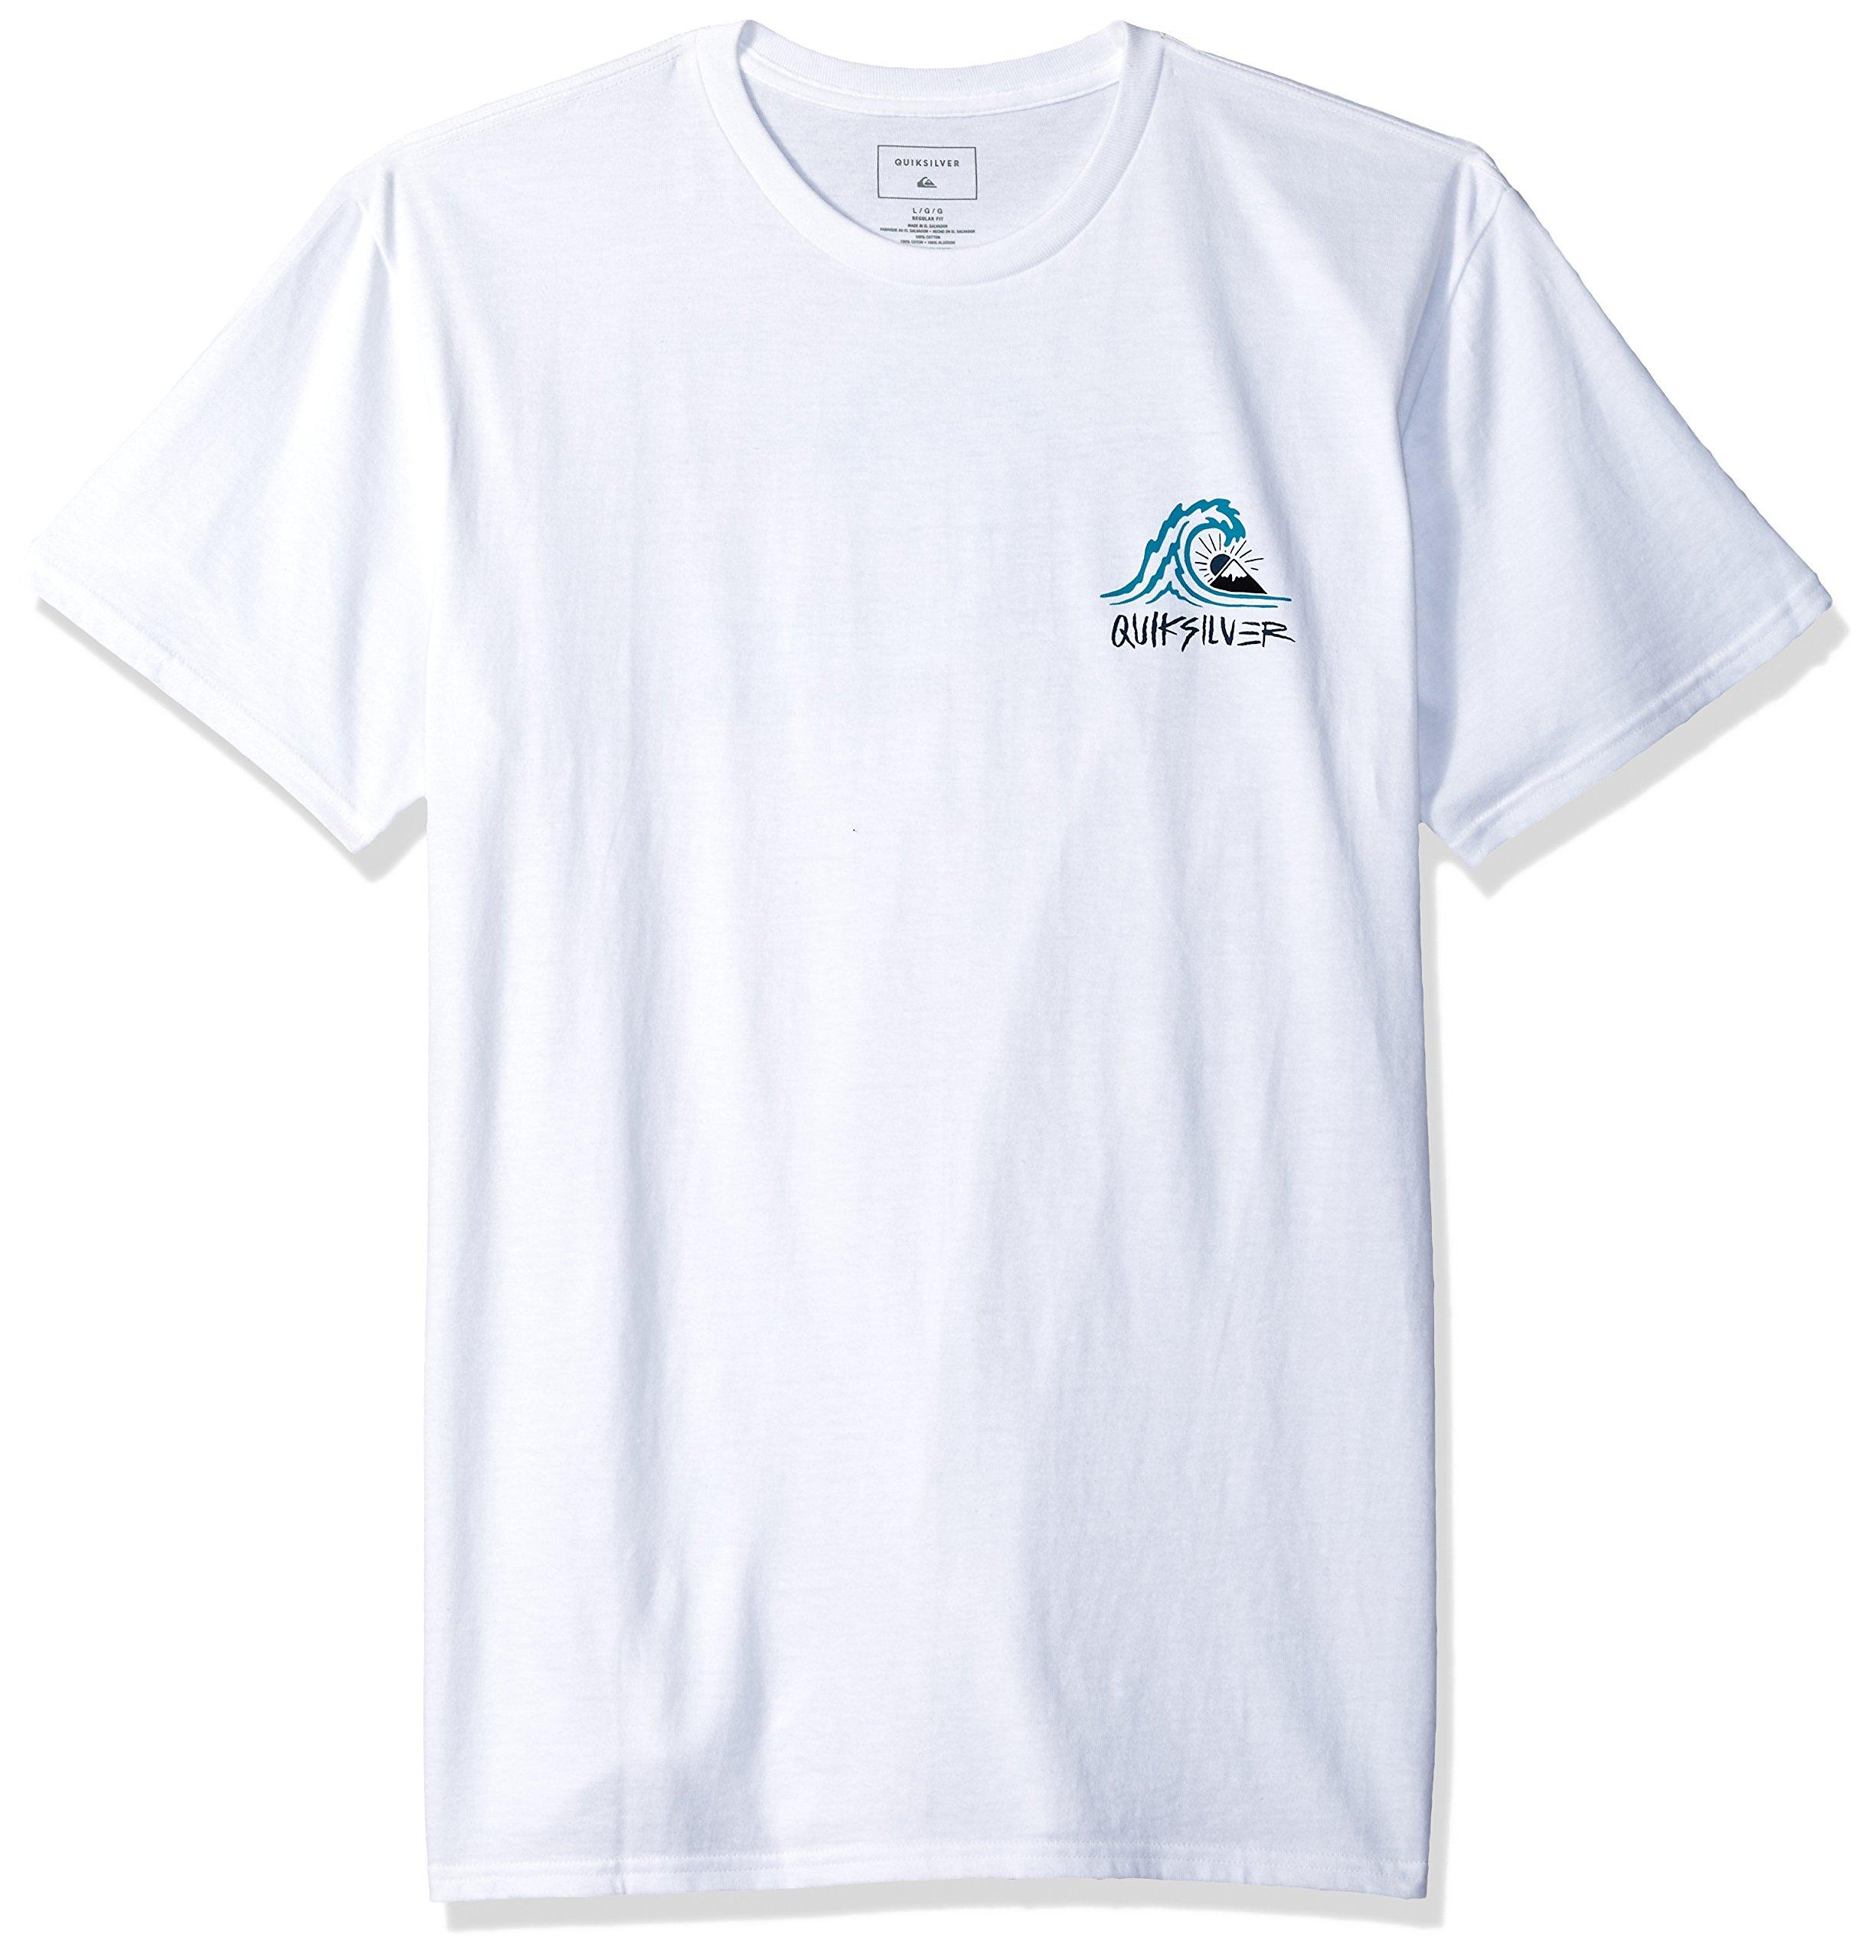 Quiksilver Men's Quik in The Box Tee Shirt, White, L